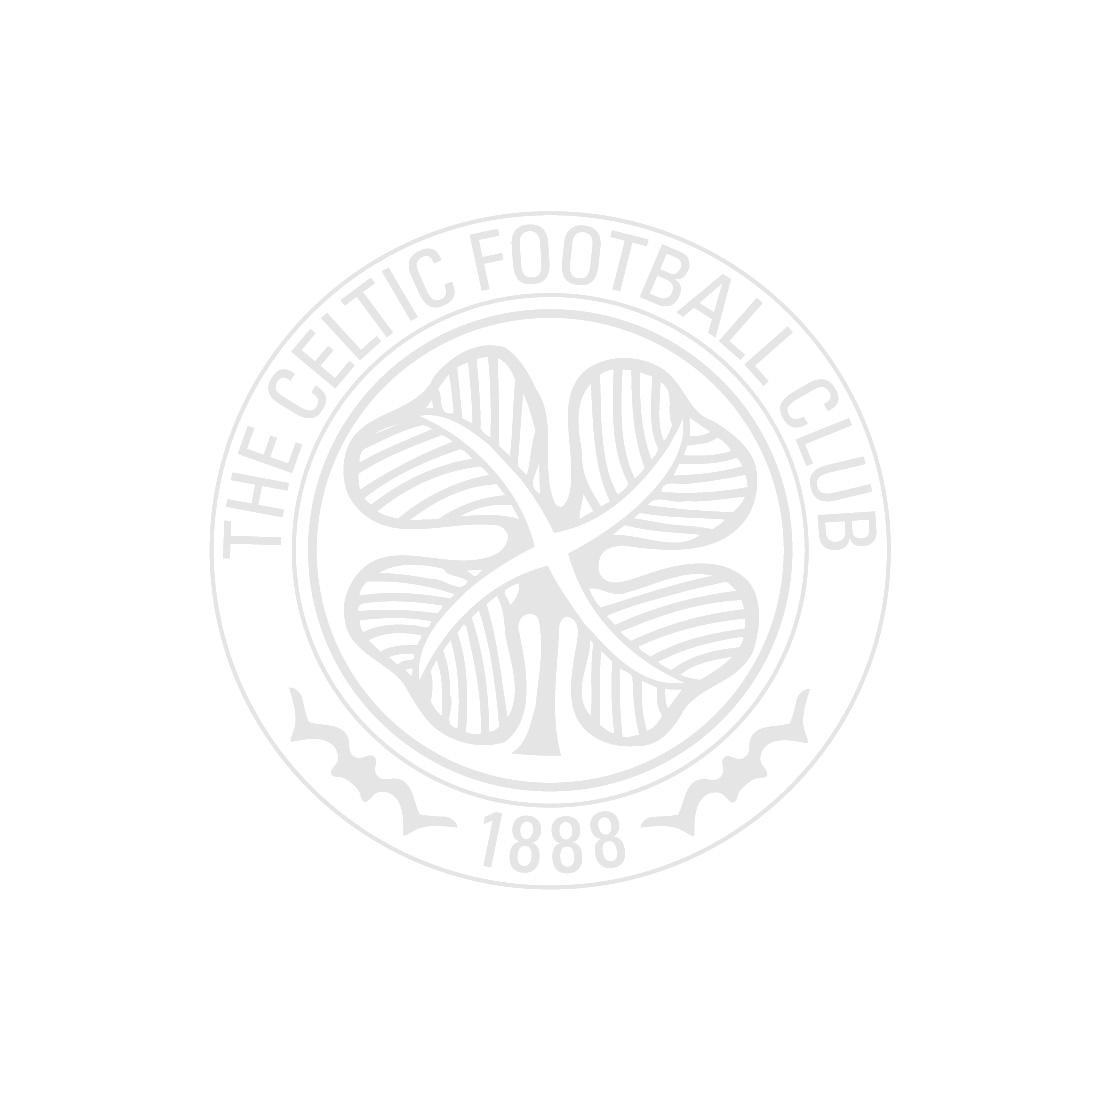 Celtic Metallic Crest Over The Ear Headphones